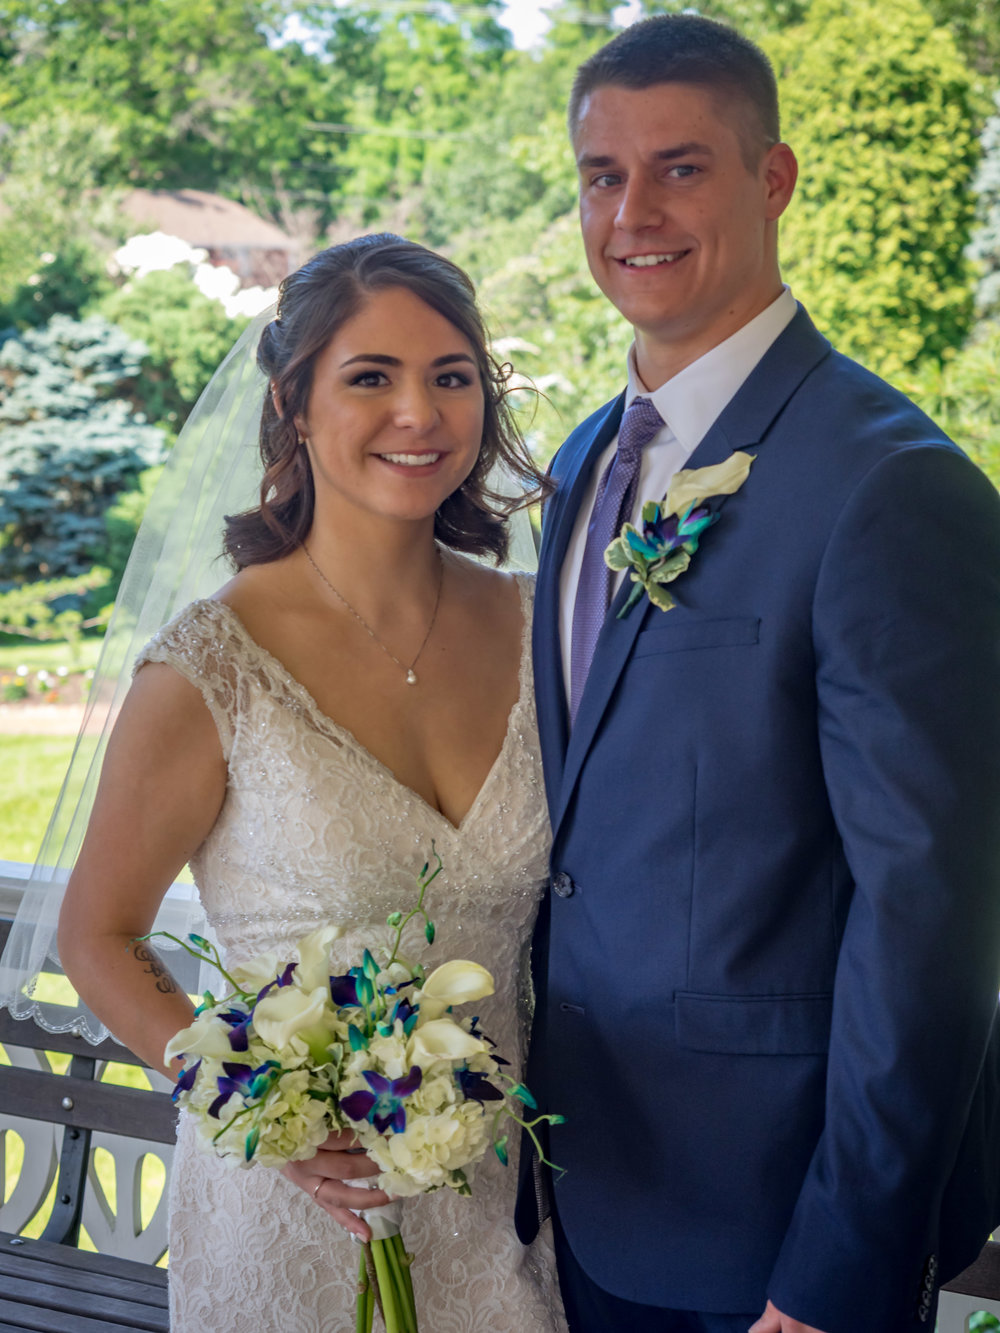 10 - Haines Couple - 20180616 - Haines -67461.jpg